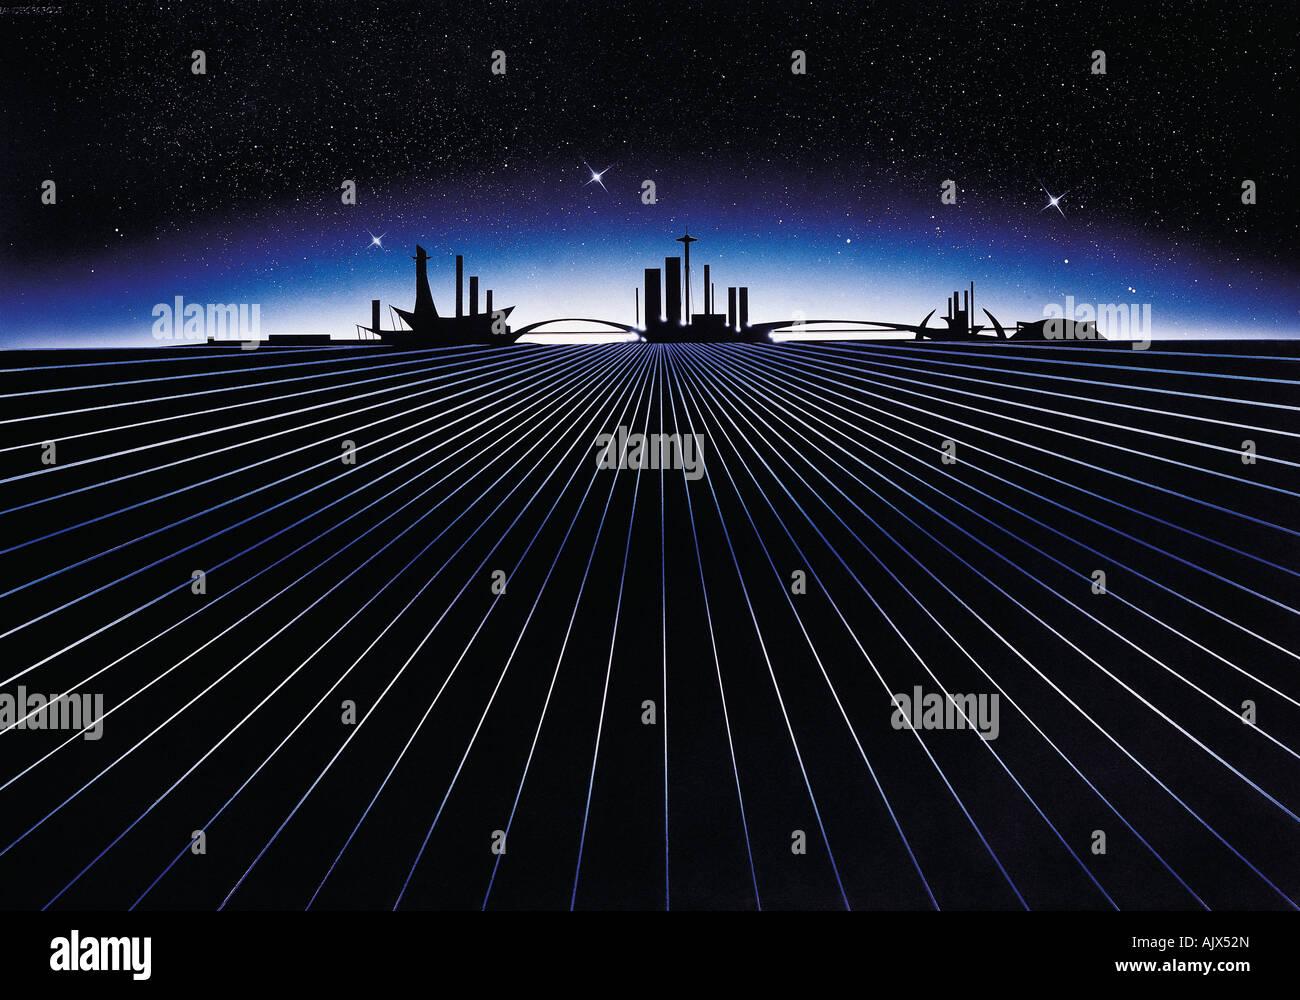 Artwork illustration of futuristic city, - Stock Image